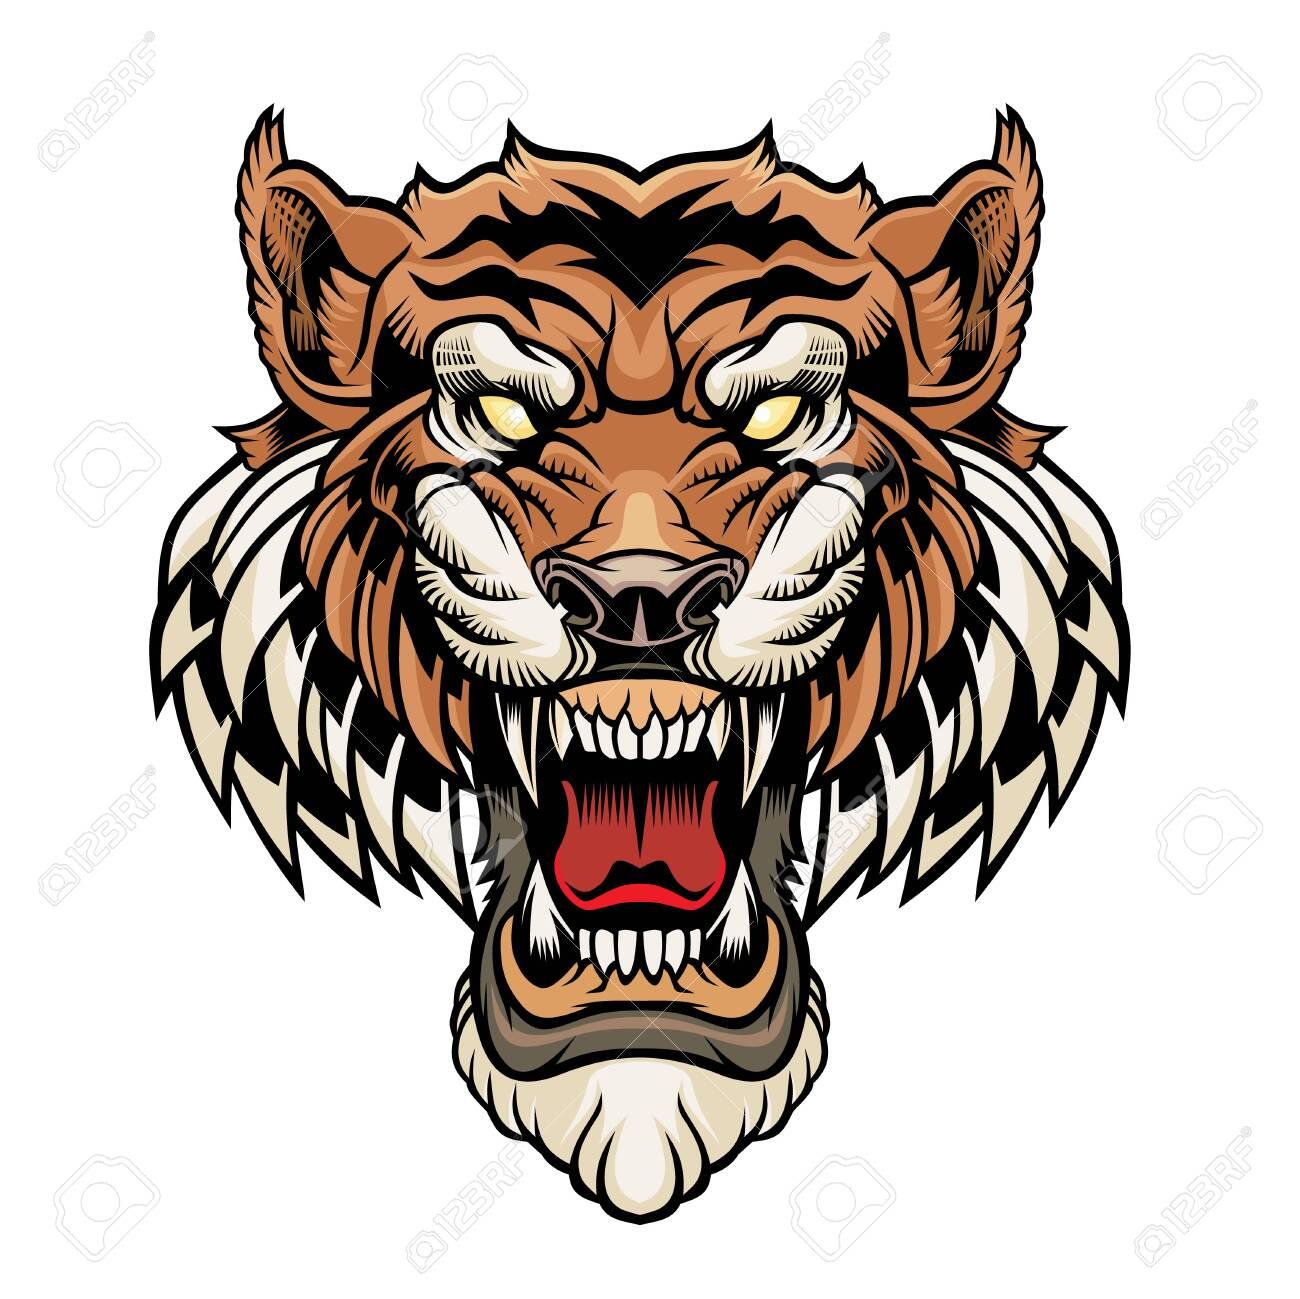 Tiger head. - 137241194